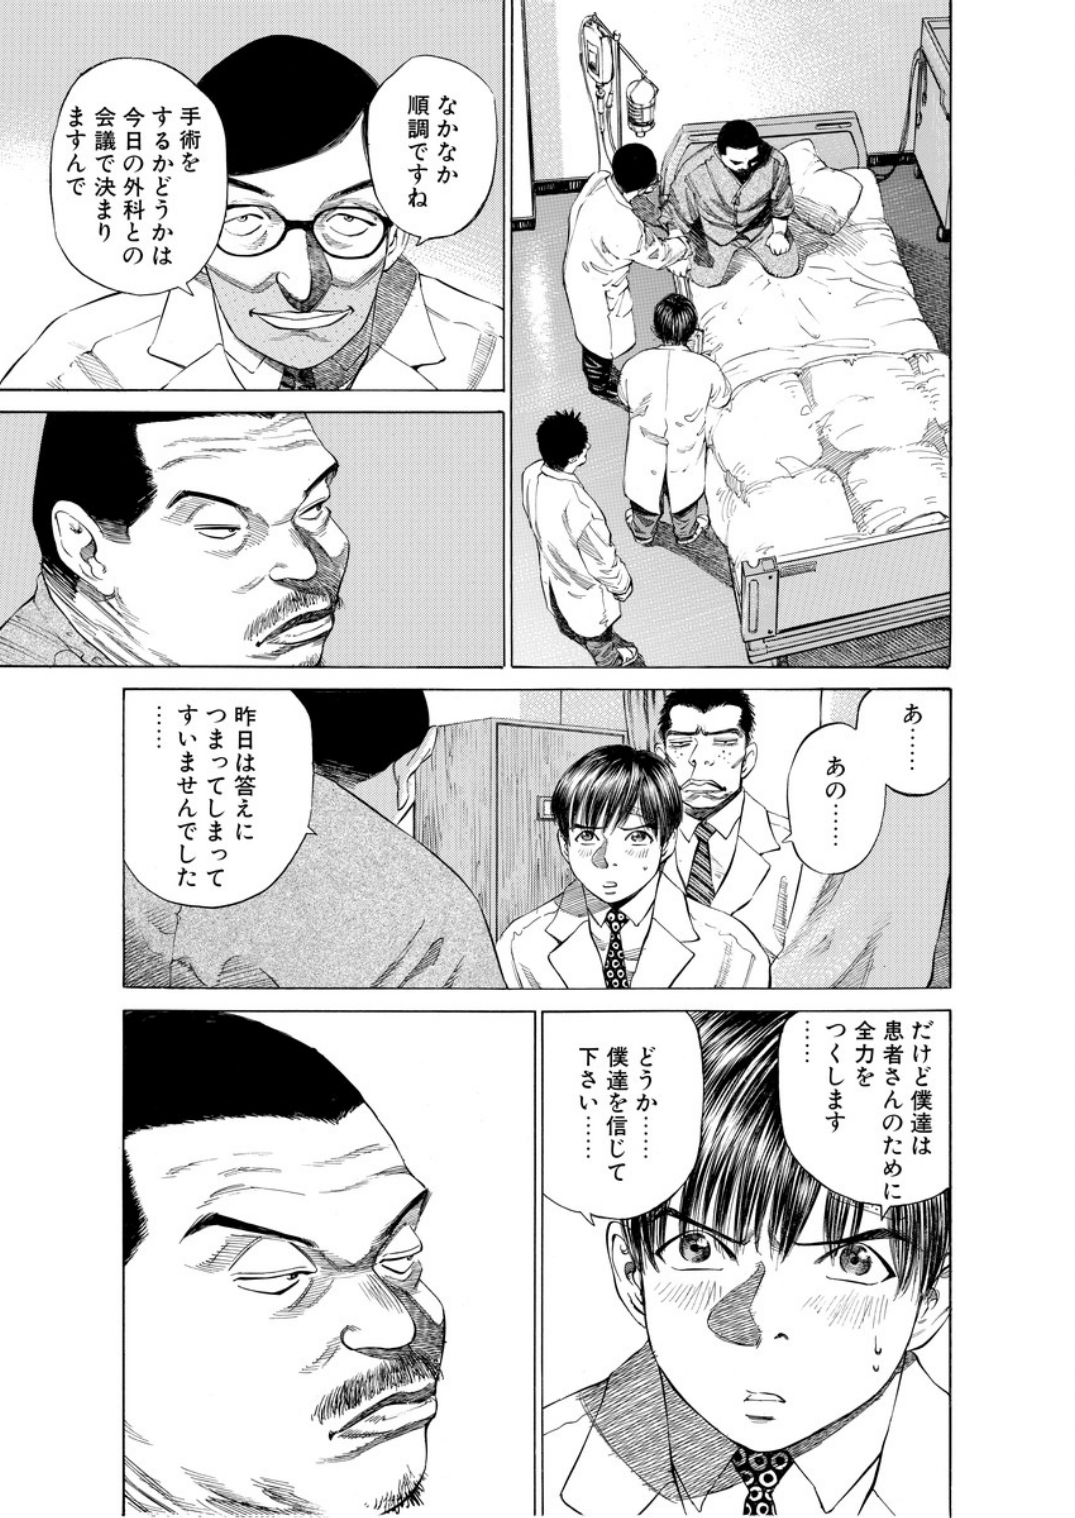 001bj_page-0193.jpg